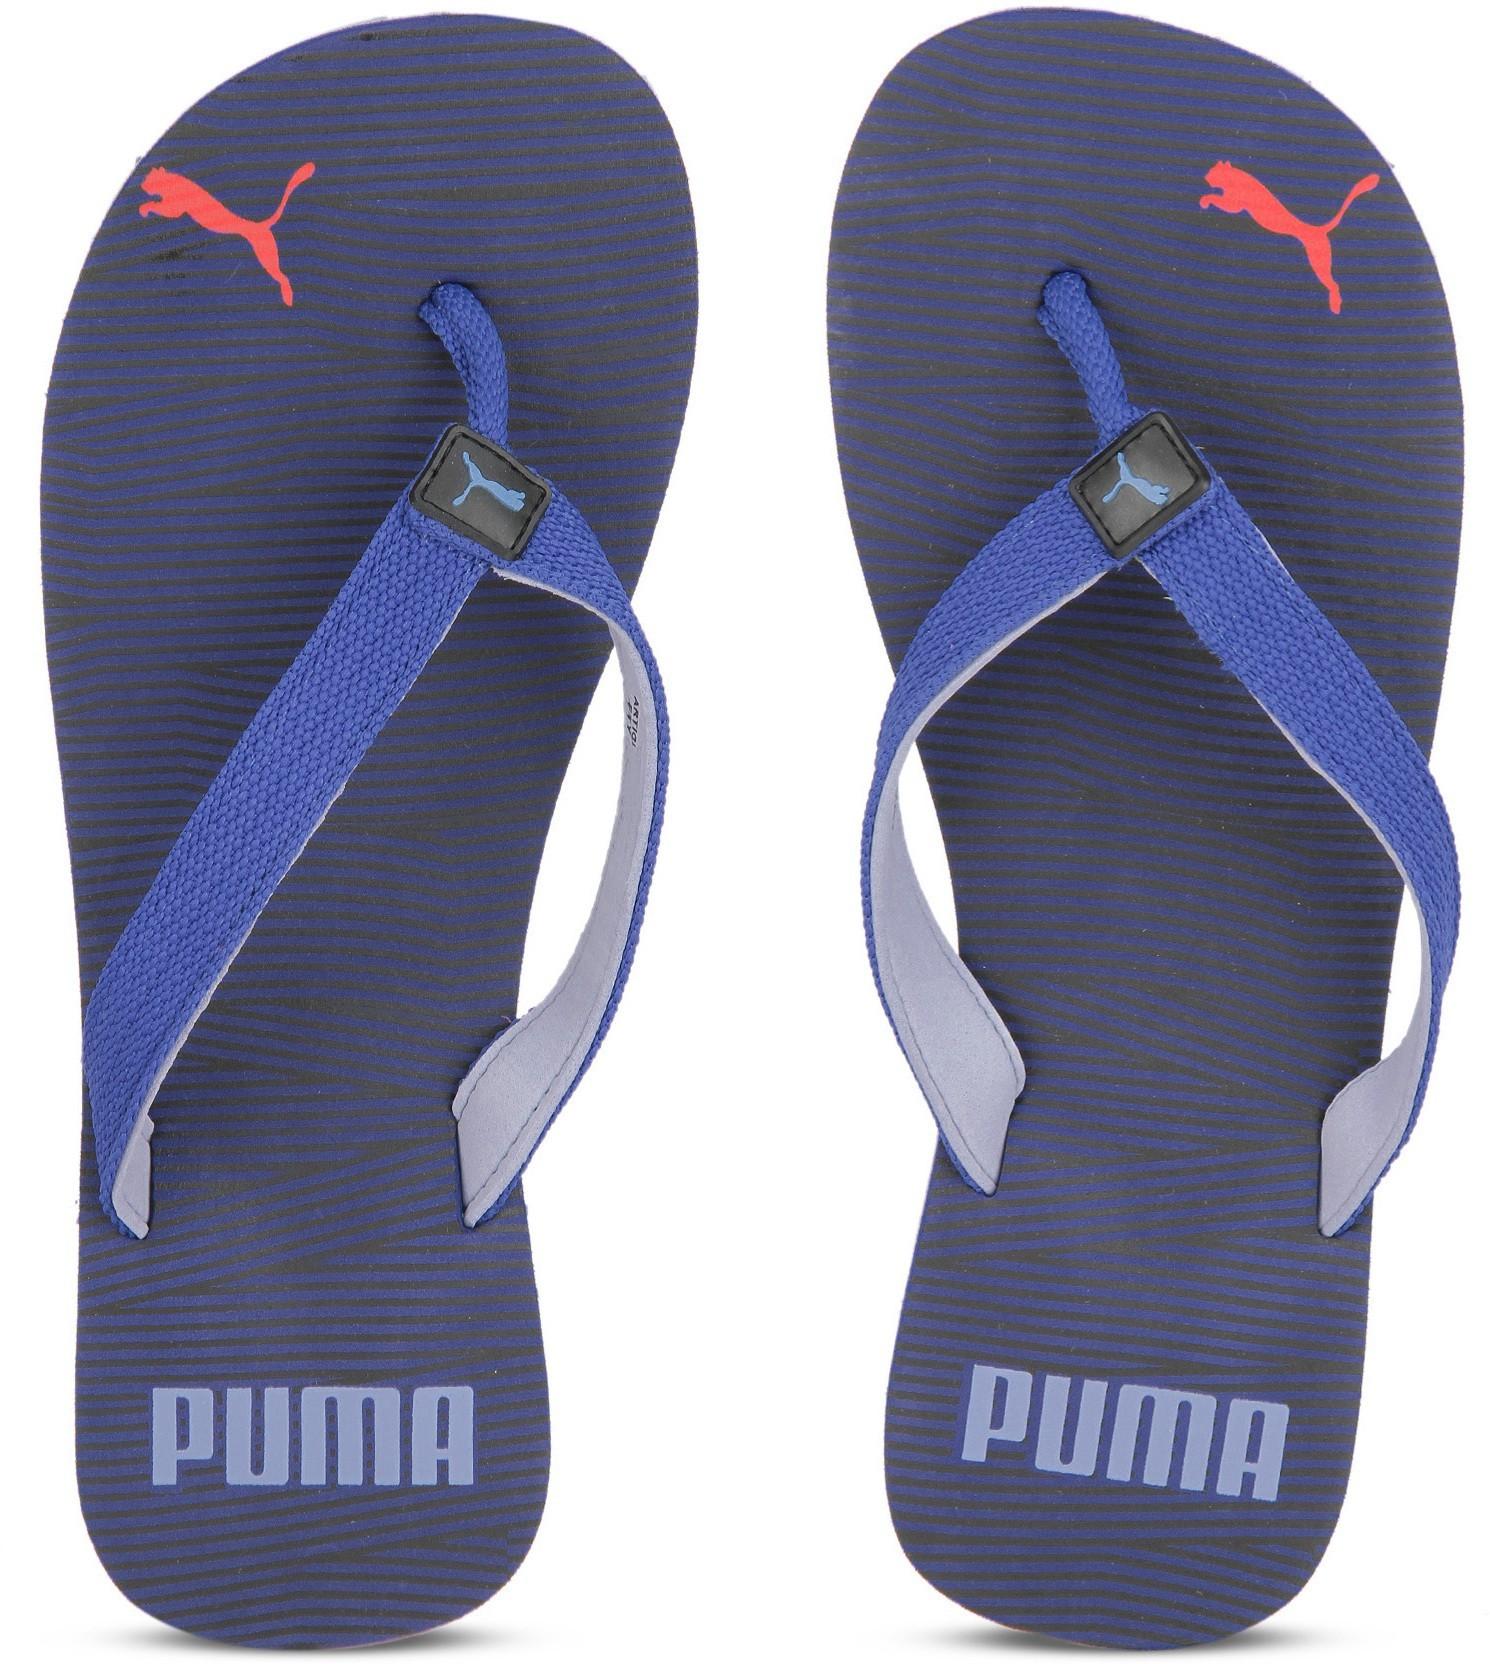 Puma Tide Gu Idp Slippers Buy Mazarine Blue Color Musi White Nokha Sneakers Women Putih 39 Add To Cart Now